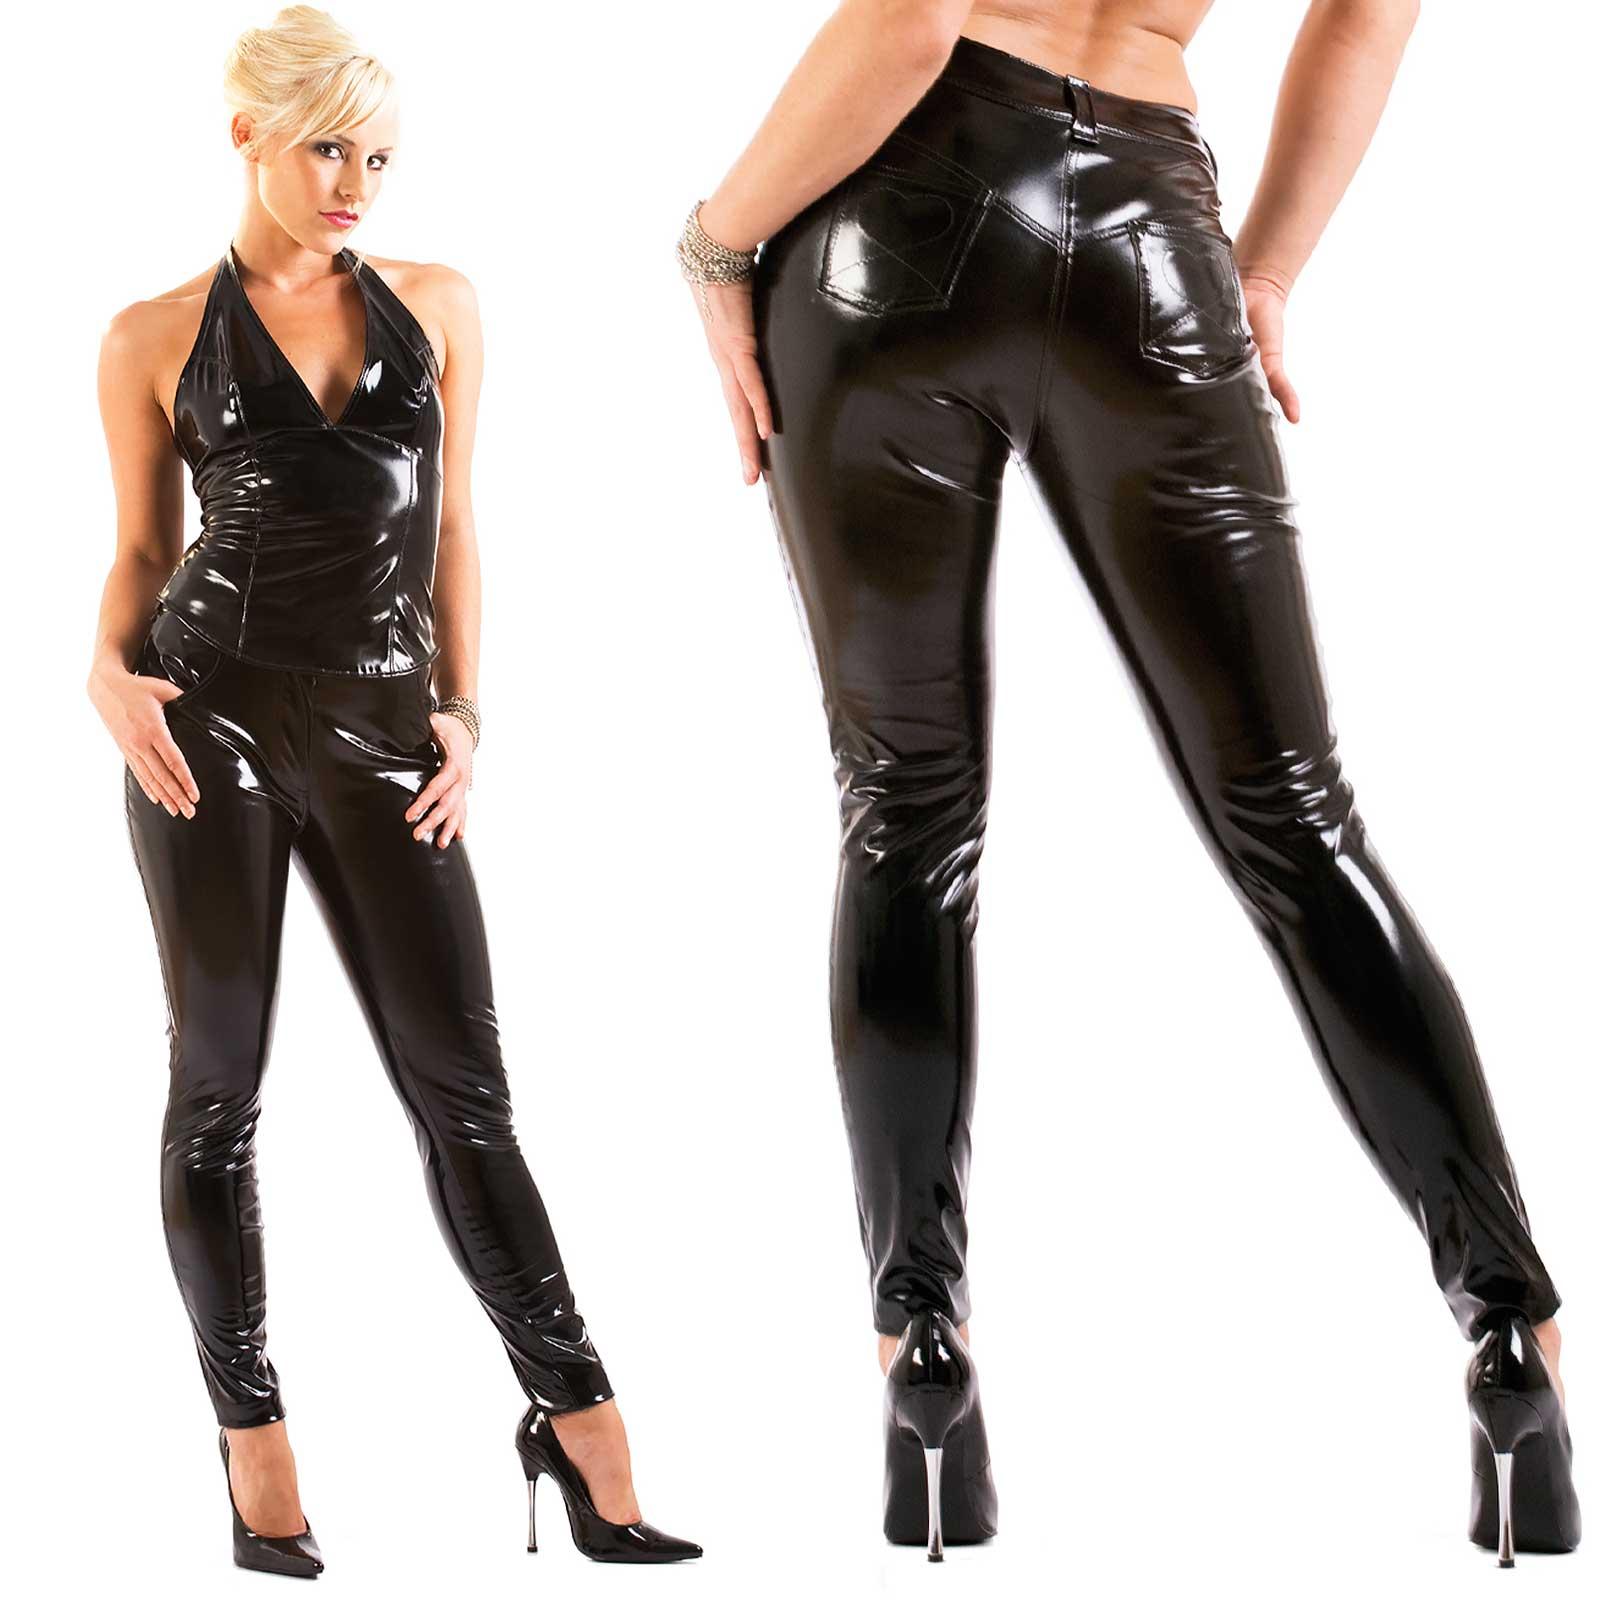 d70a55e29ef69e Detail image to HONOUR Women PVC Pants Black